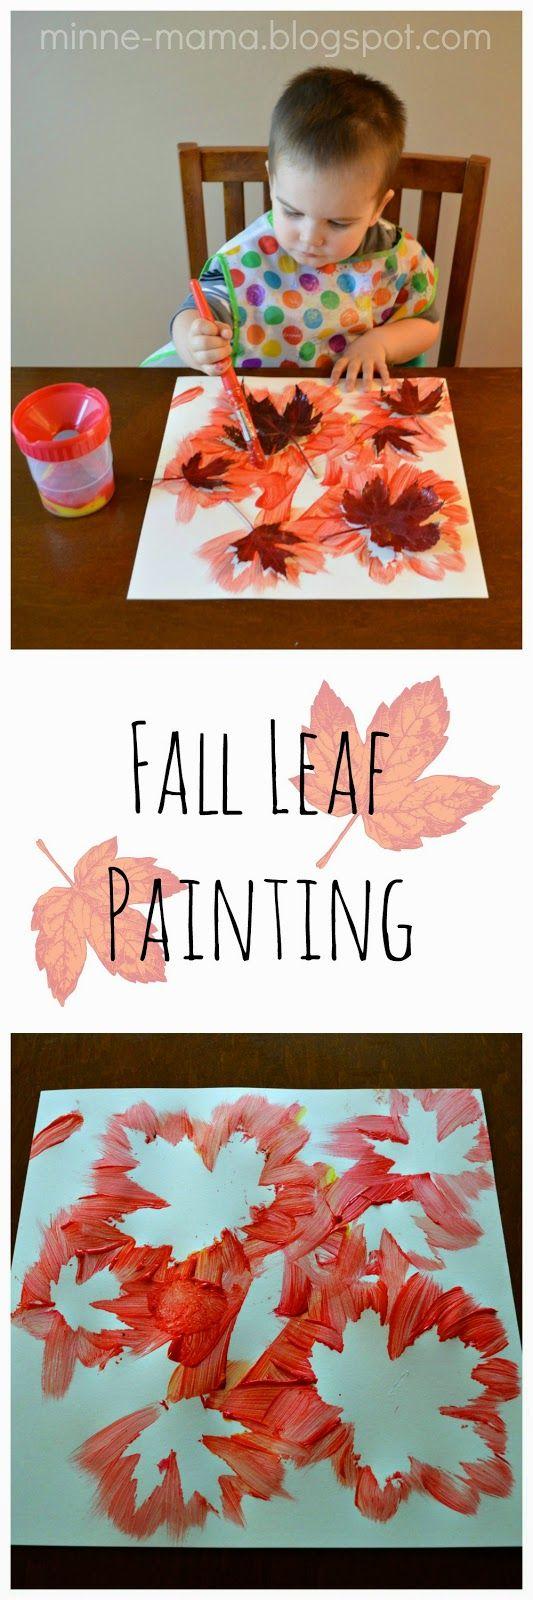 Fall Leaf Painting.